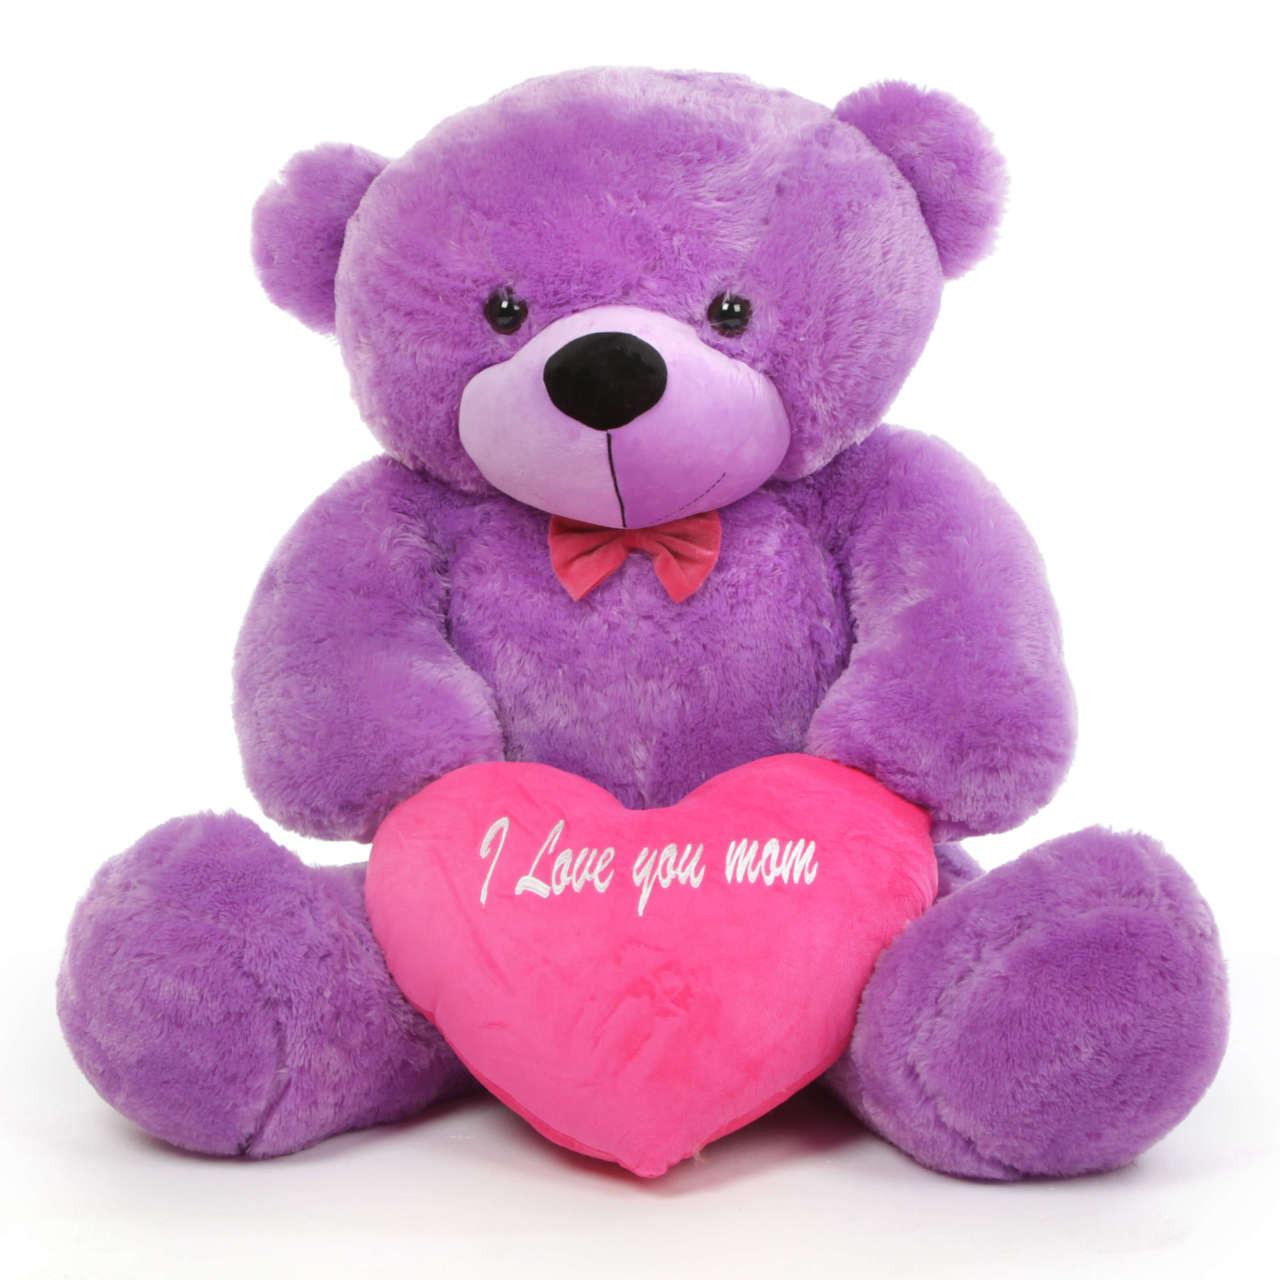 Deedee m cuddles 48 purple teddy bear w i love you mom heart deedee m cuddles purple teddy bear with i love you mom heart 48in altavistaventures Choice Image